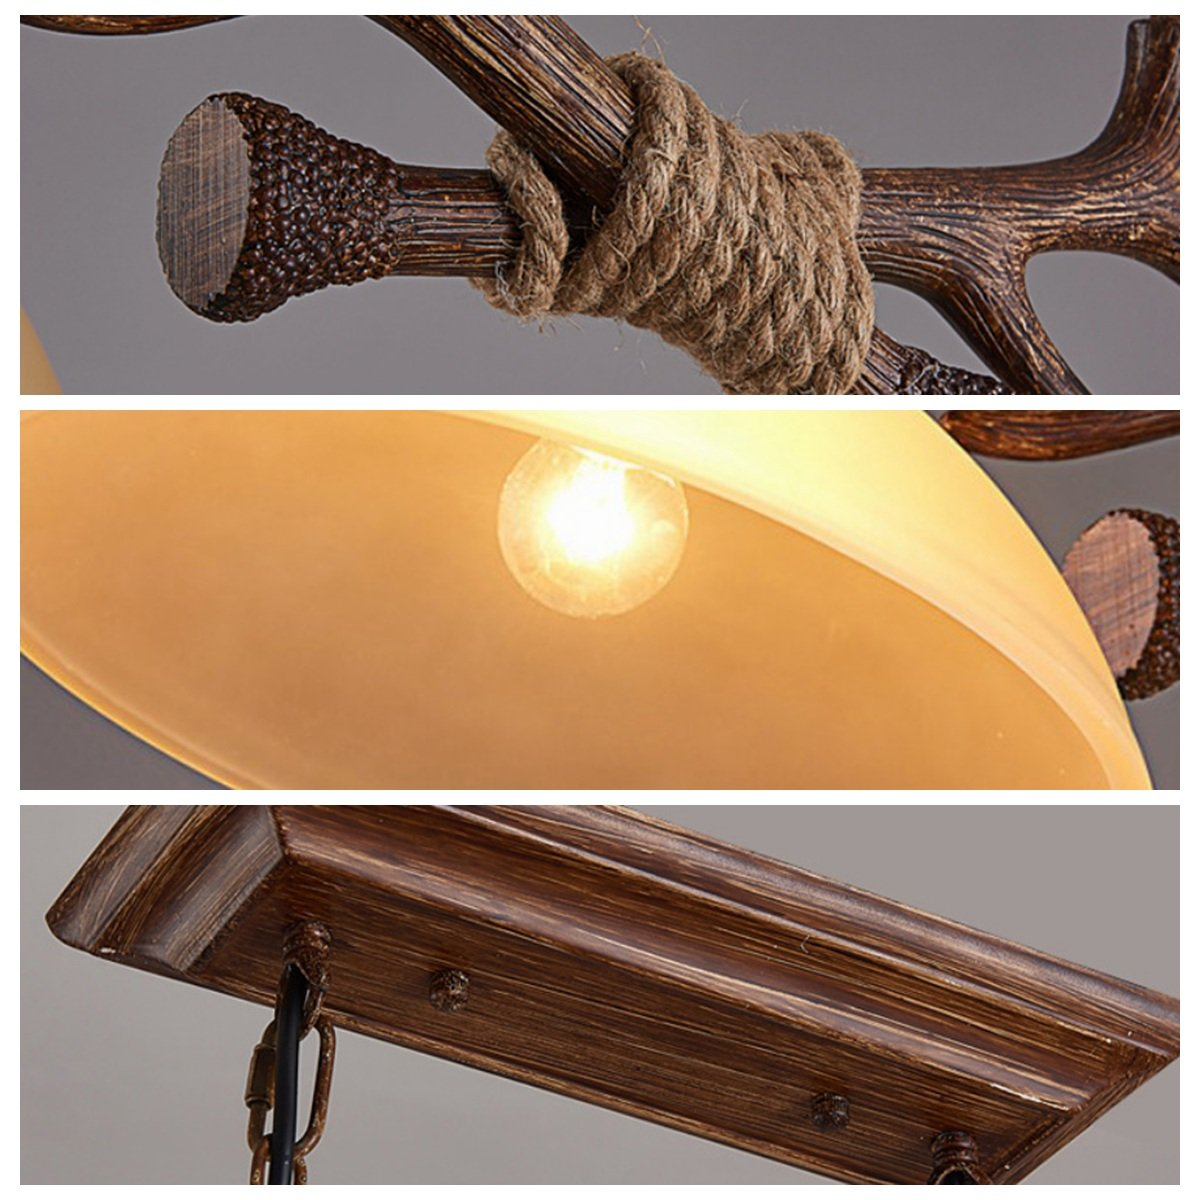 2 Lamps Antlers Kitchen Island Pendant Lights Chandeliers Double R H Antique Ceiling Lights Dining Decoration Island Light Vintage Antler Hanging Lamp